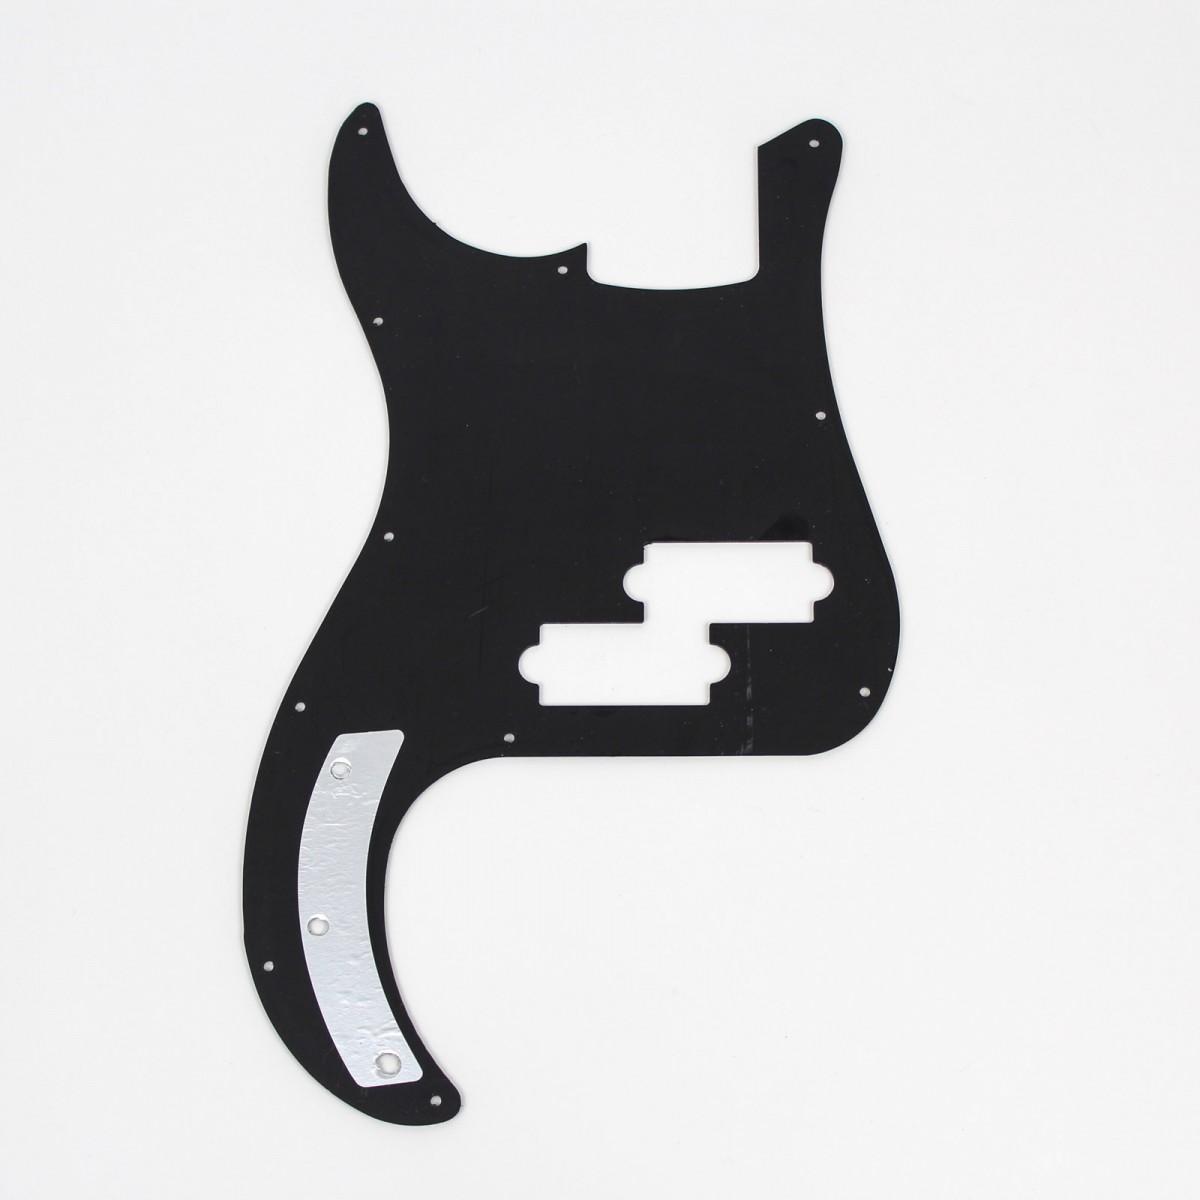 fender precision bass style pickguard diy guitars. Black Bedroom Furniture Sets. Home Design Ideas